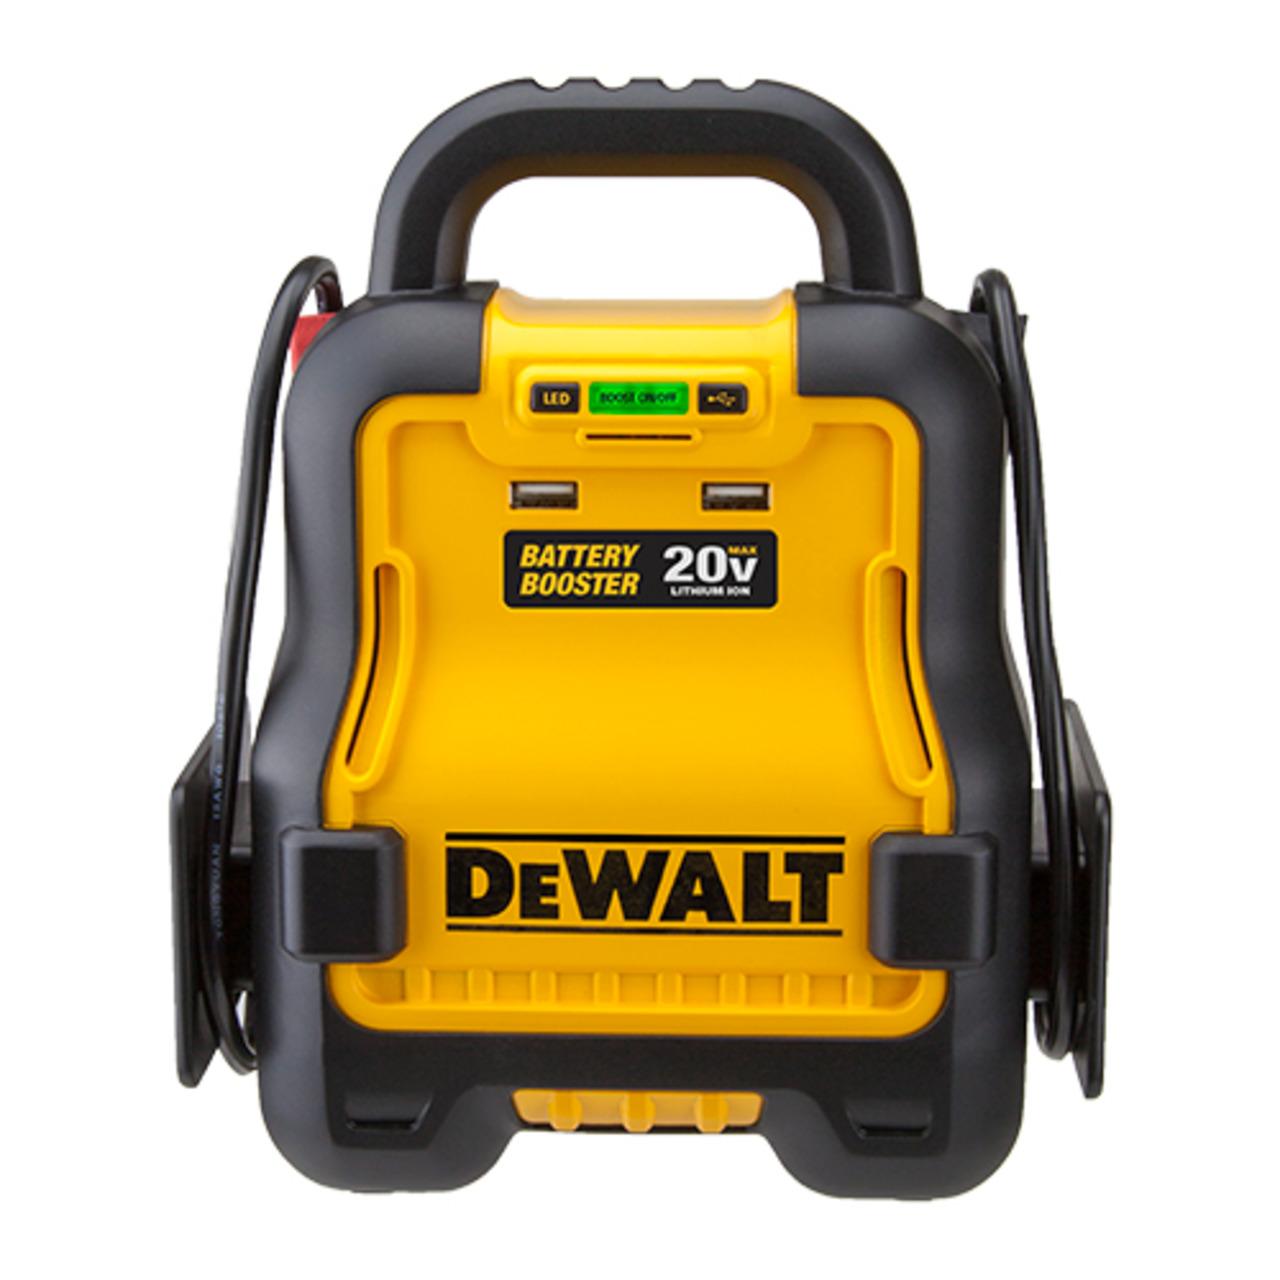 DeWalt 20V Lithium Simple Start Battery Booster in Jump Starters